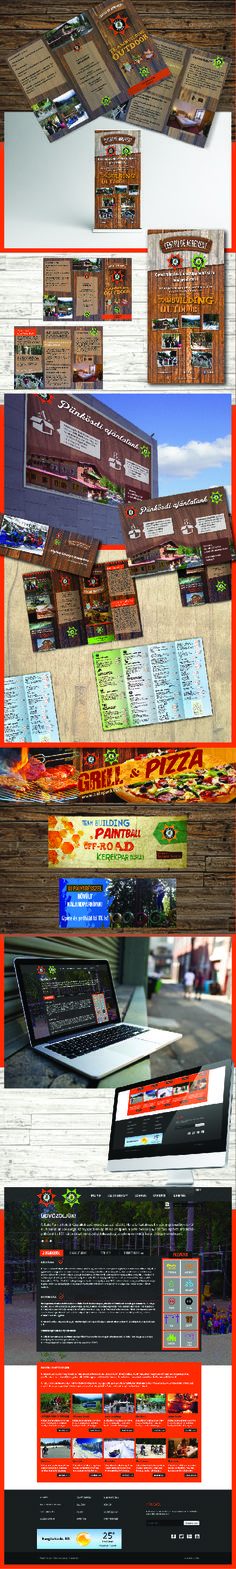 Flyer - Banner - Menu - Rollup - Mockup design for Balu Park - Romania #1 Adventure Park